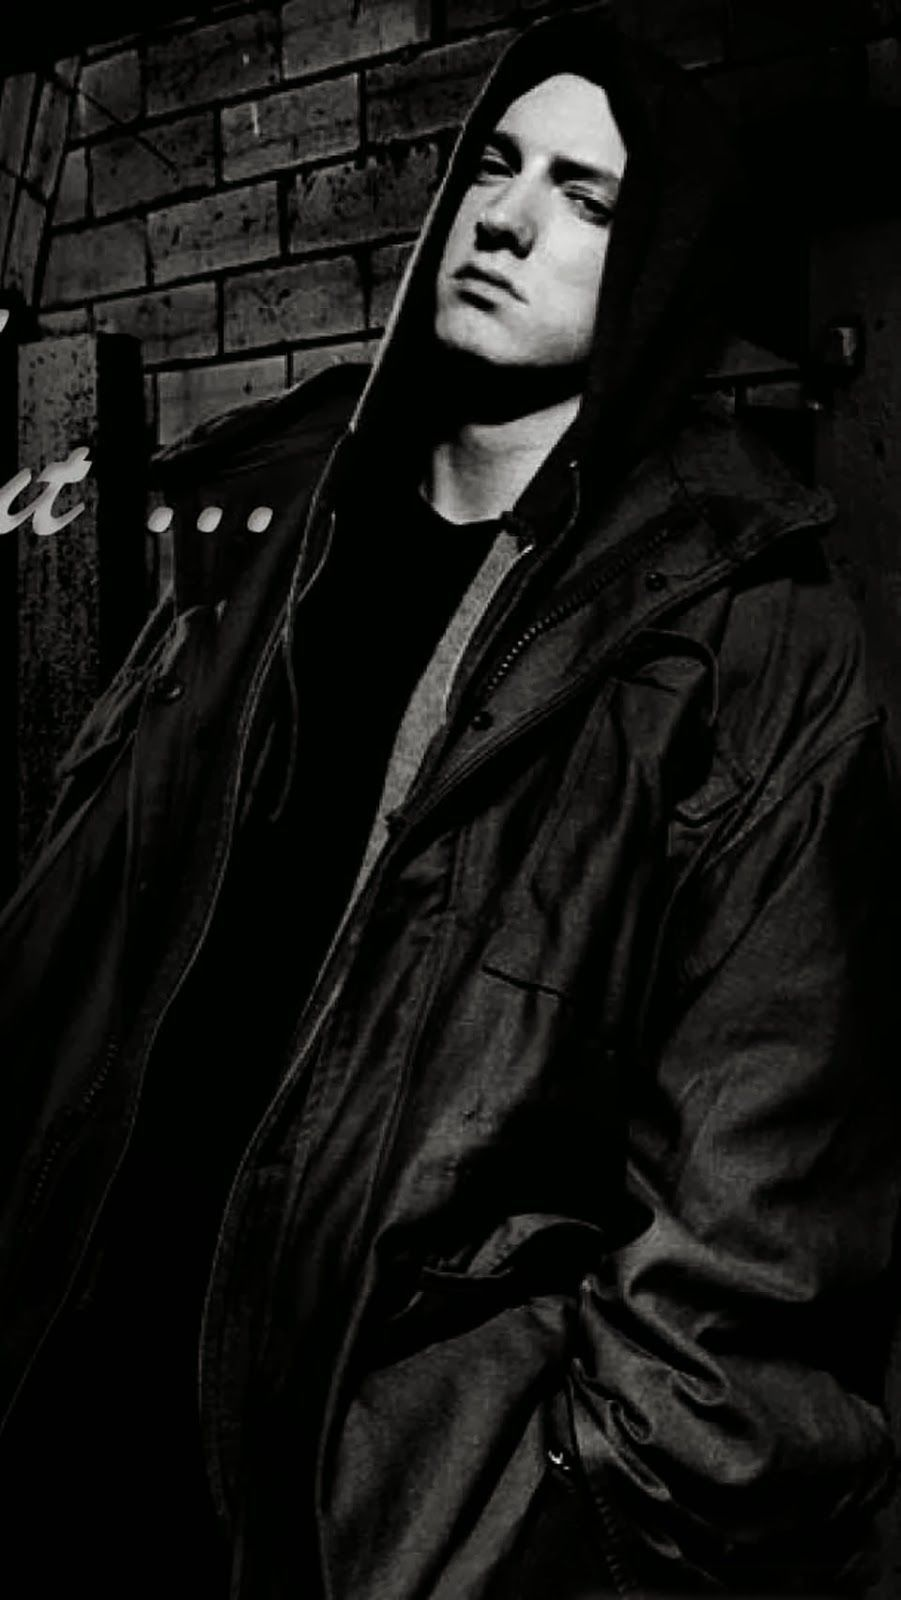 Eminem Wallpaper 4k Iphone 3d Wallpapers Eminem Wallpaper Iphone Eminem Wallpapers Eminem